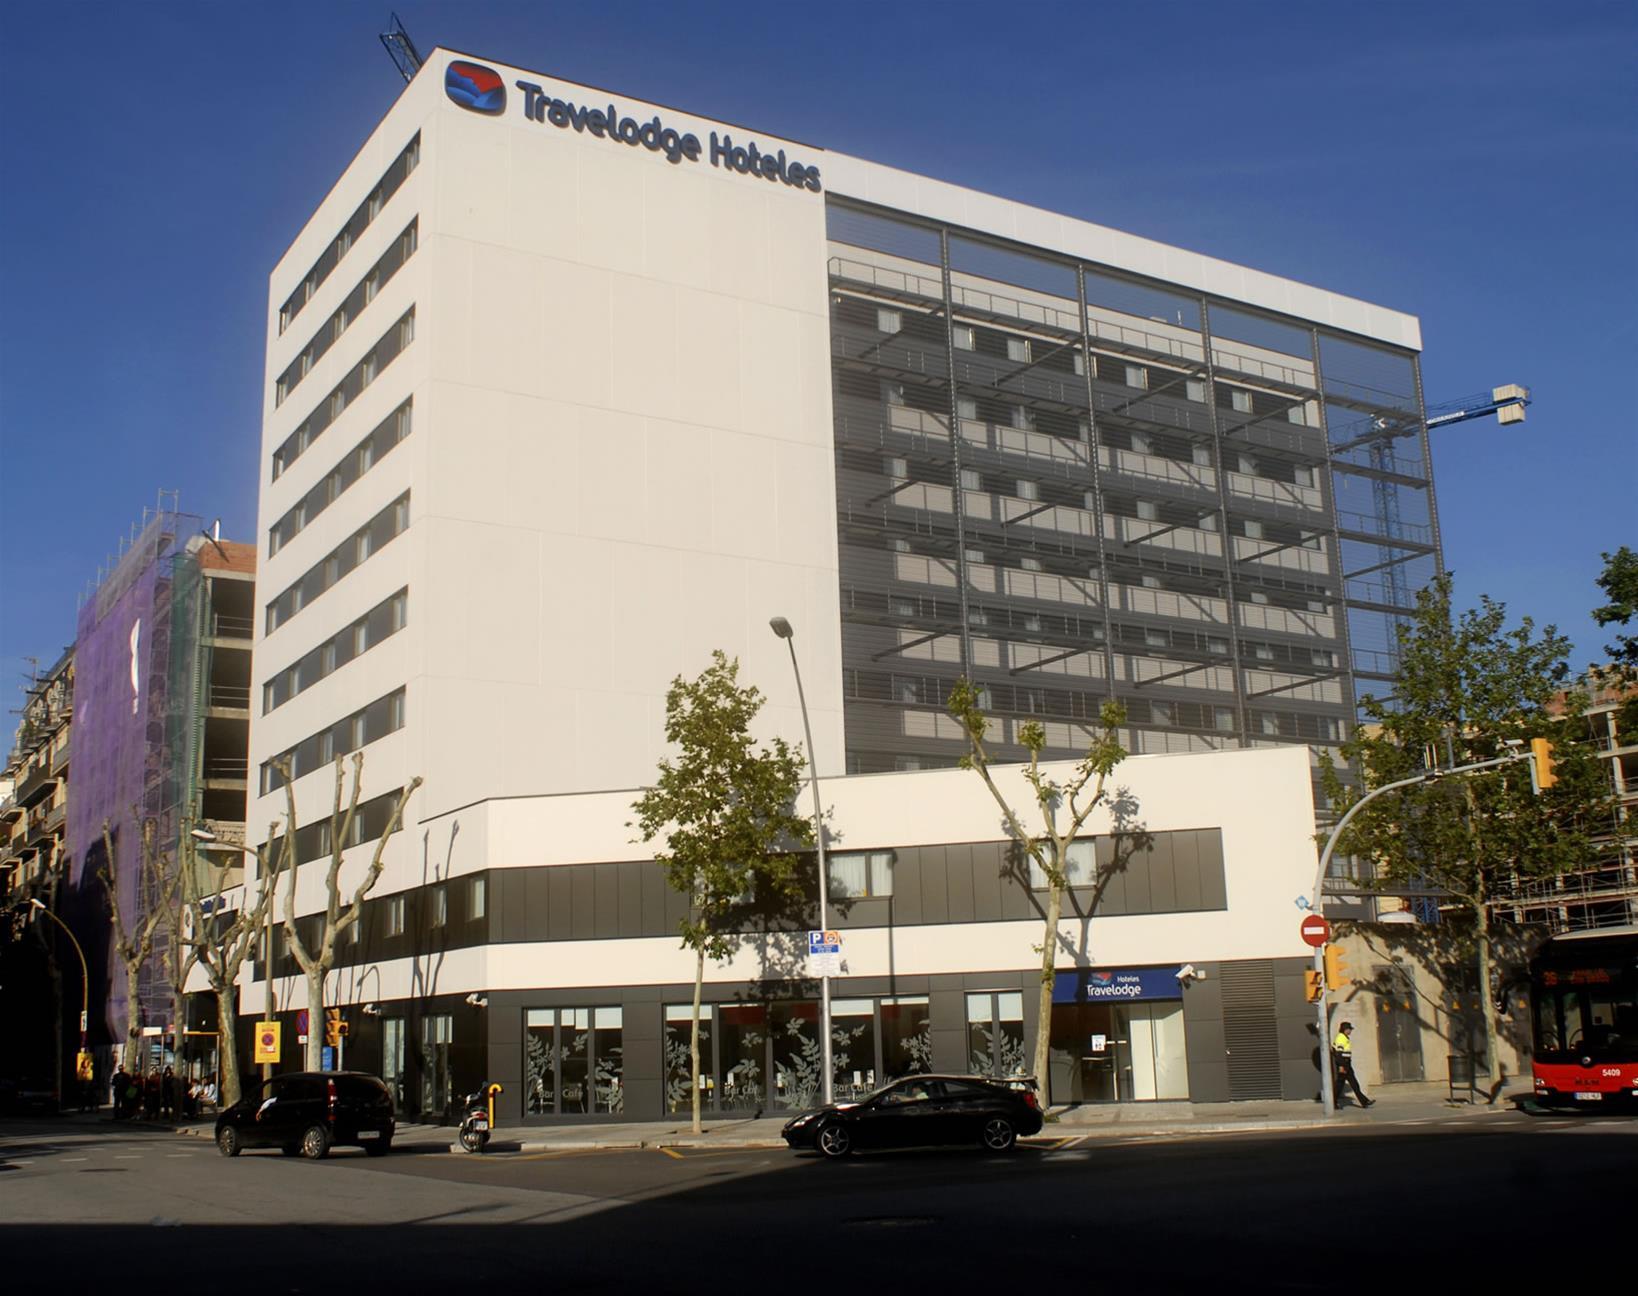 Trenes barcelona desde 44 billetes de tren renfe y ave for Ave hotel barcelona madrid